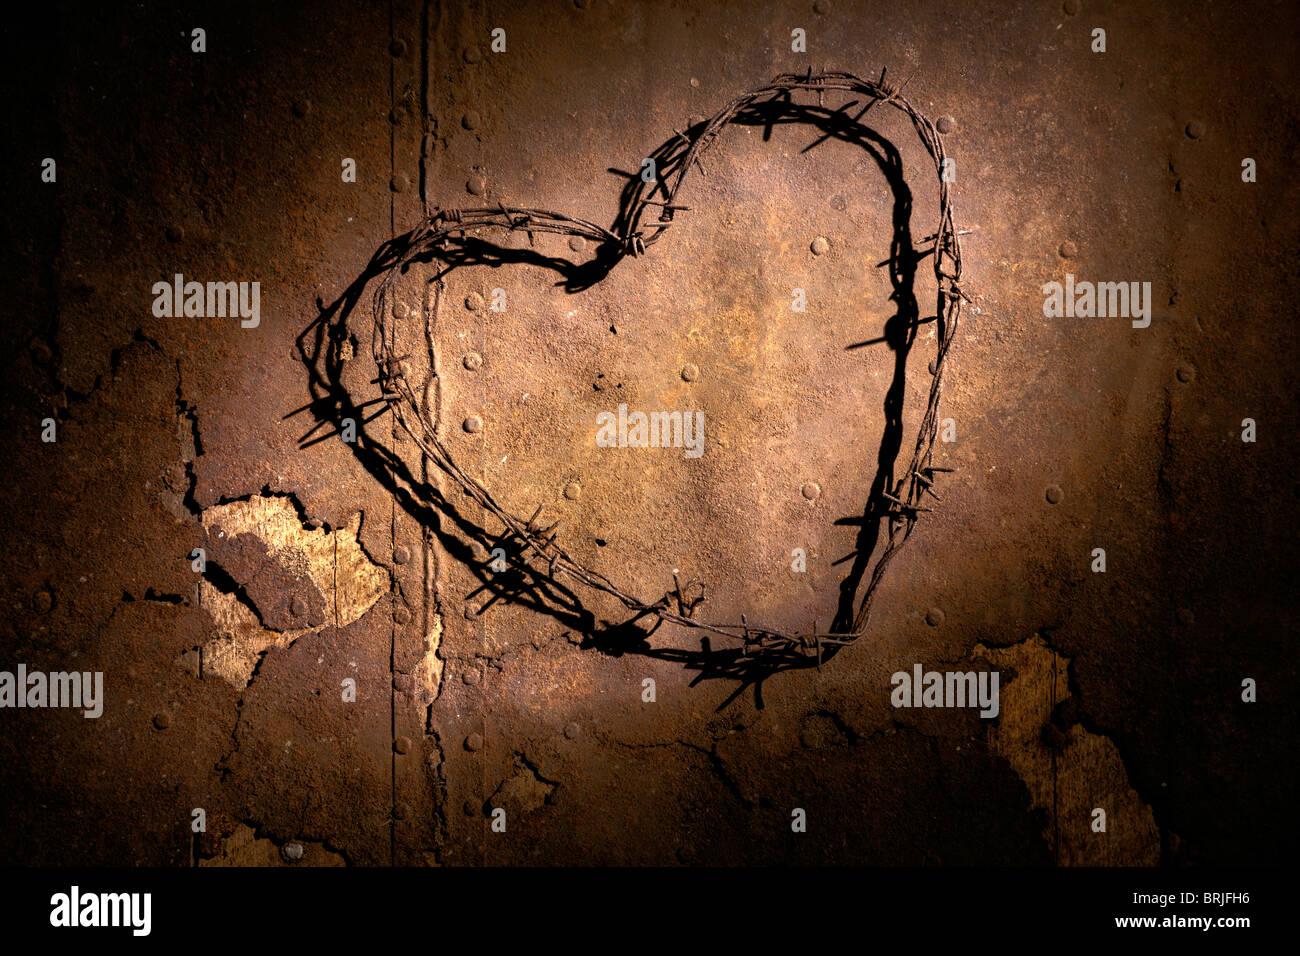 Barbwire heart - Stock Image